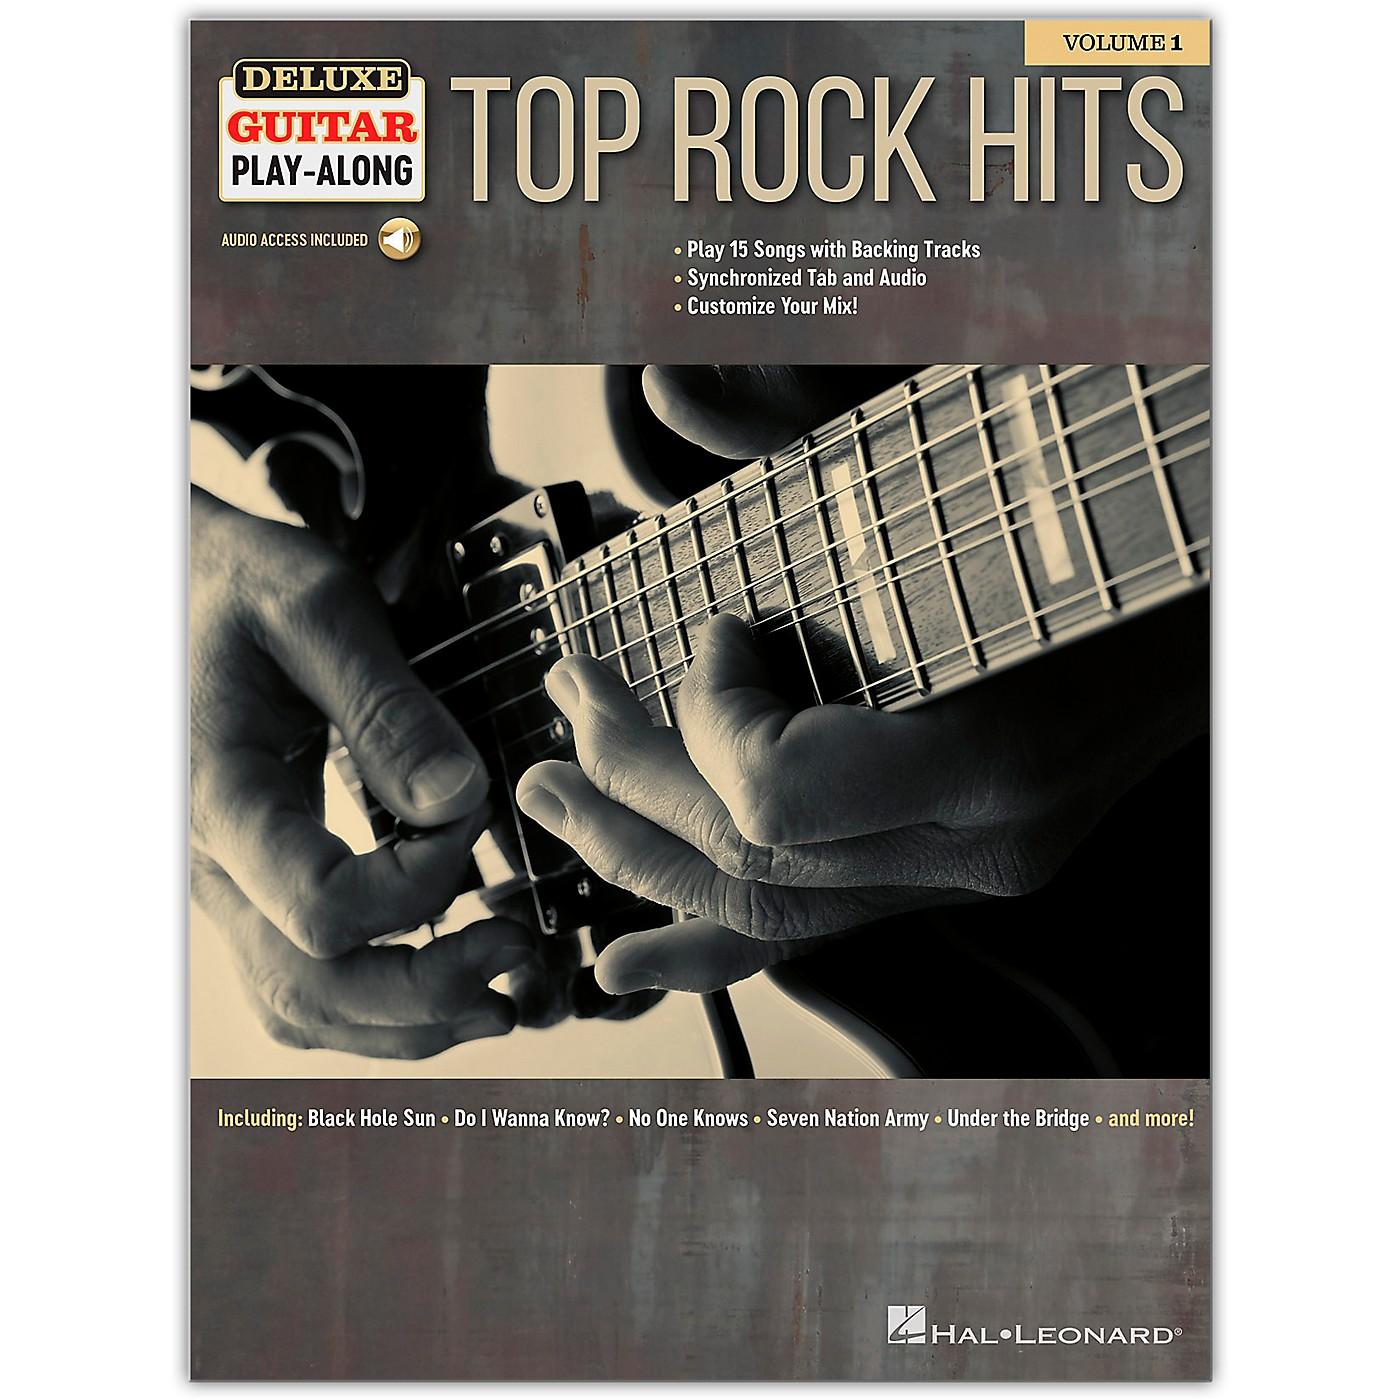 Hal Leonard Top Rock Hits Deluxe Guitar Play-Along Volume 1 Book/Audio Online thumbnail